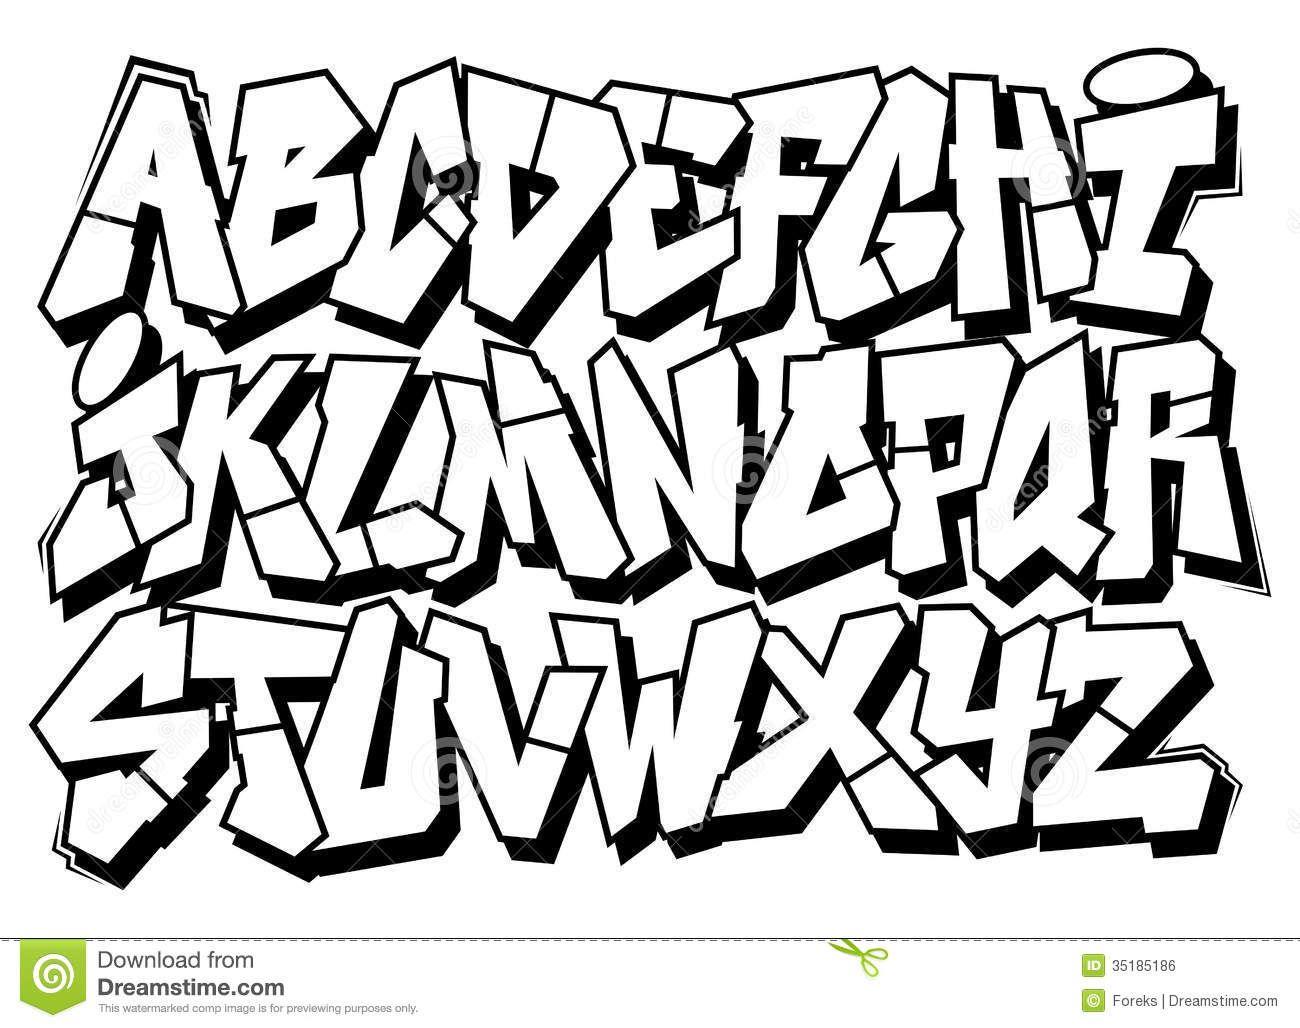 graffiti fonts - Google Search | Graffiti | Pinterest | More ...